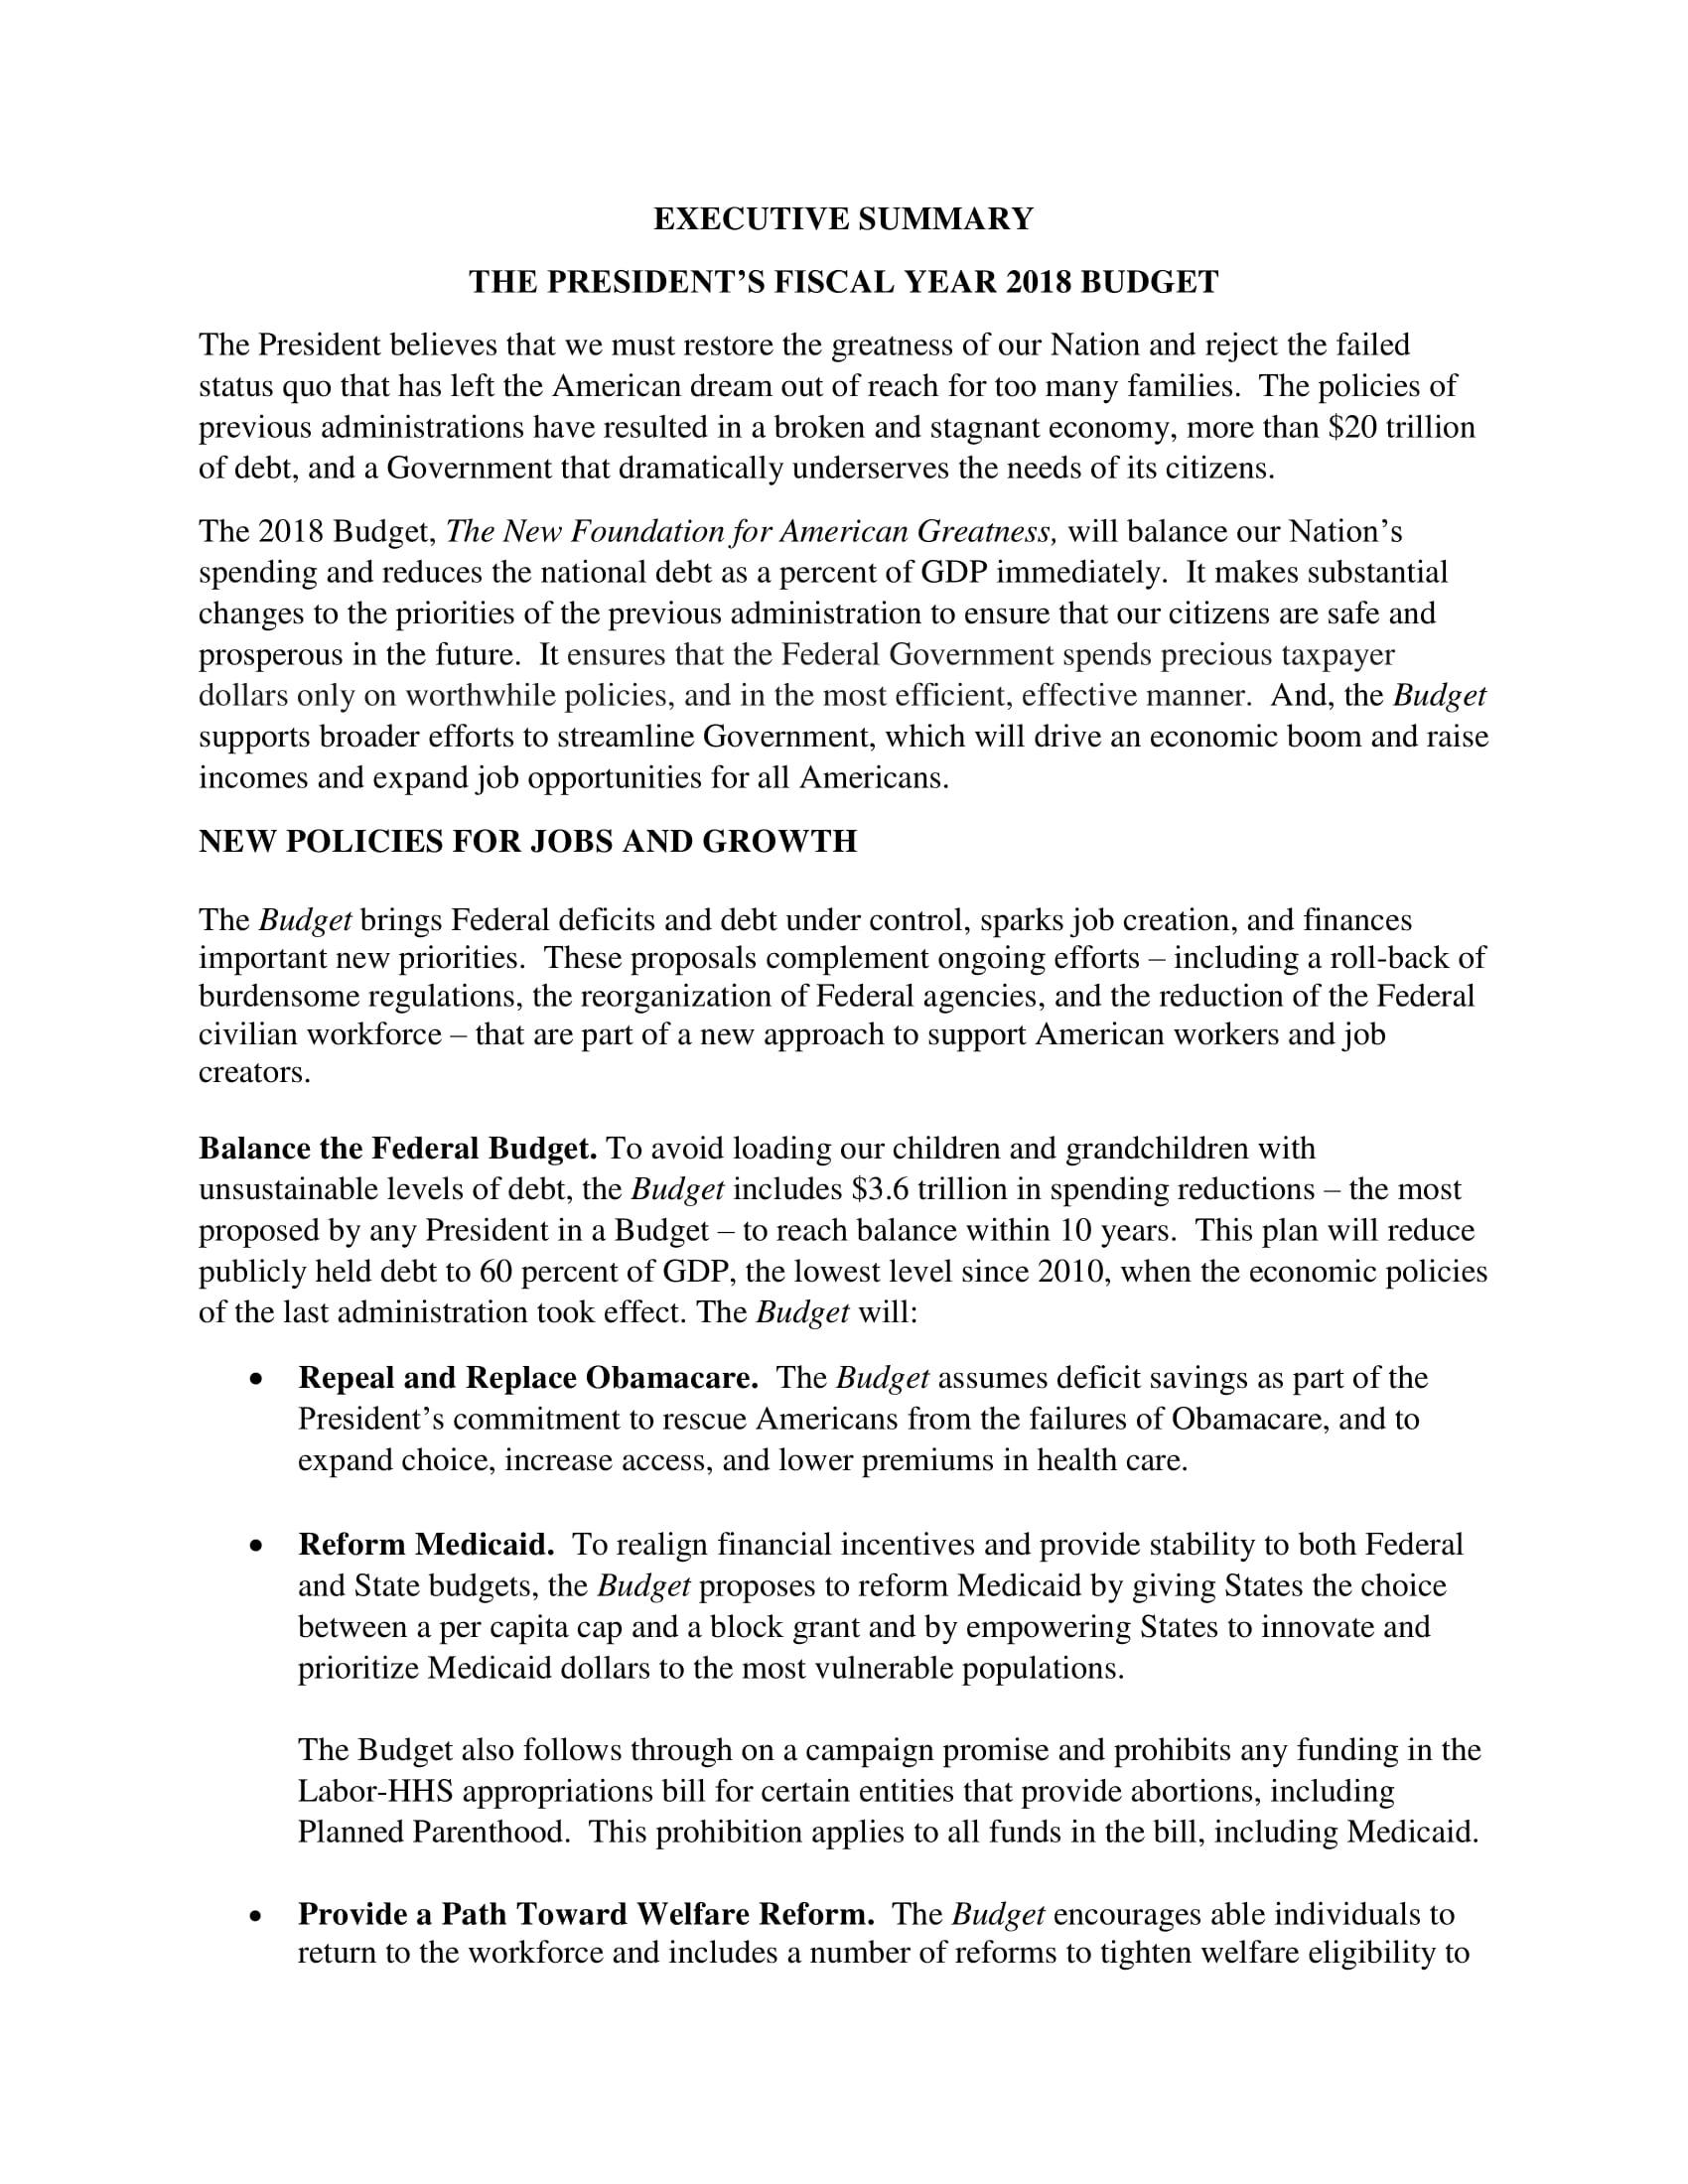 presidents fiscal yaer executive budget summary example 1